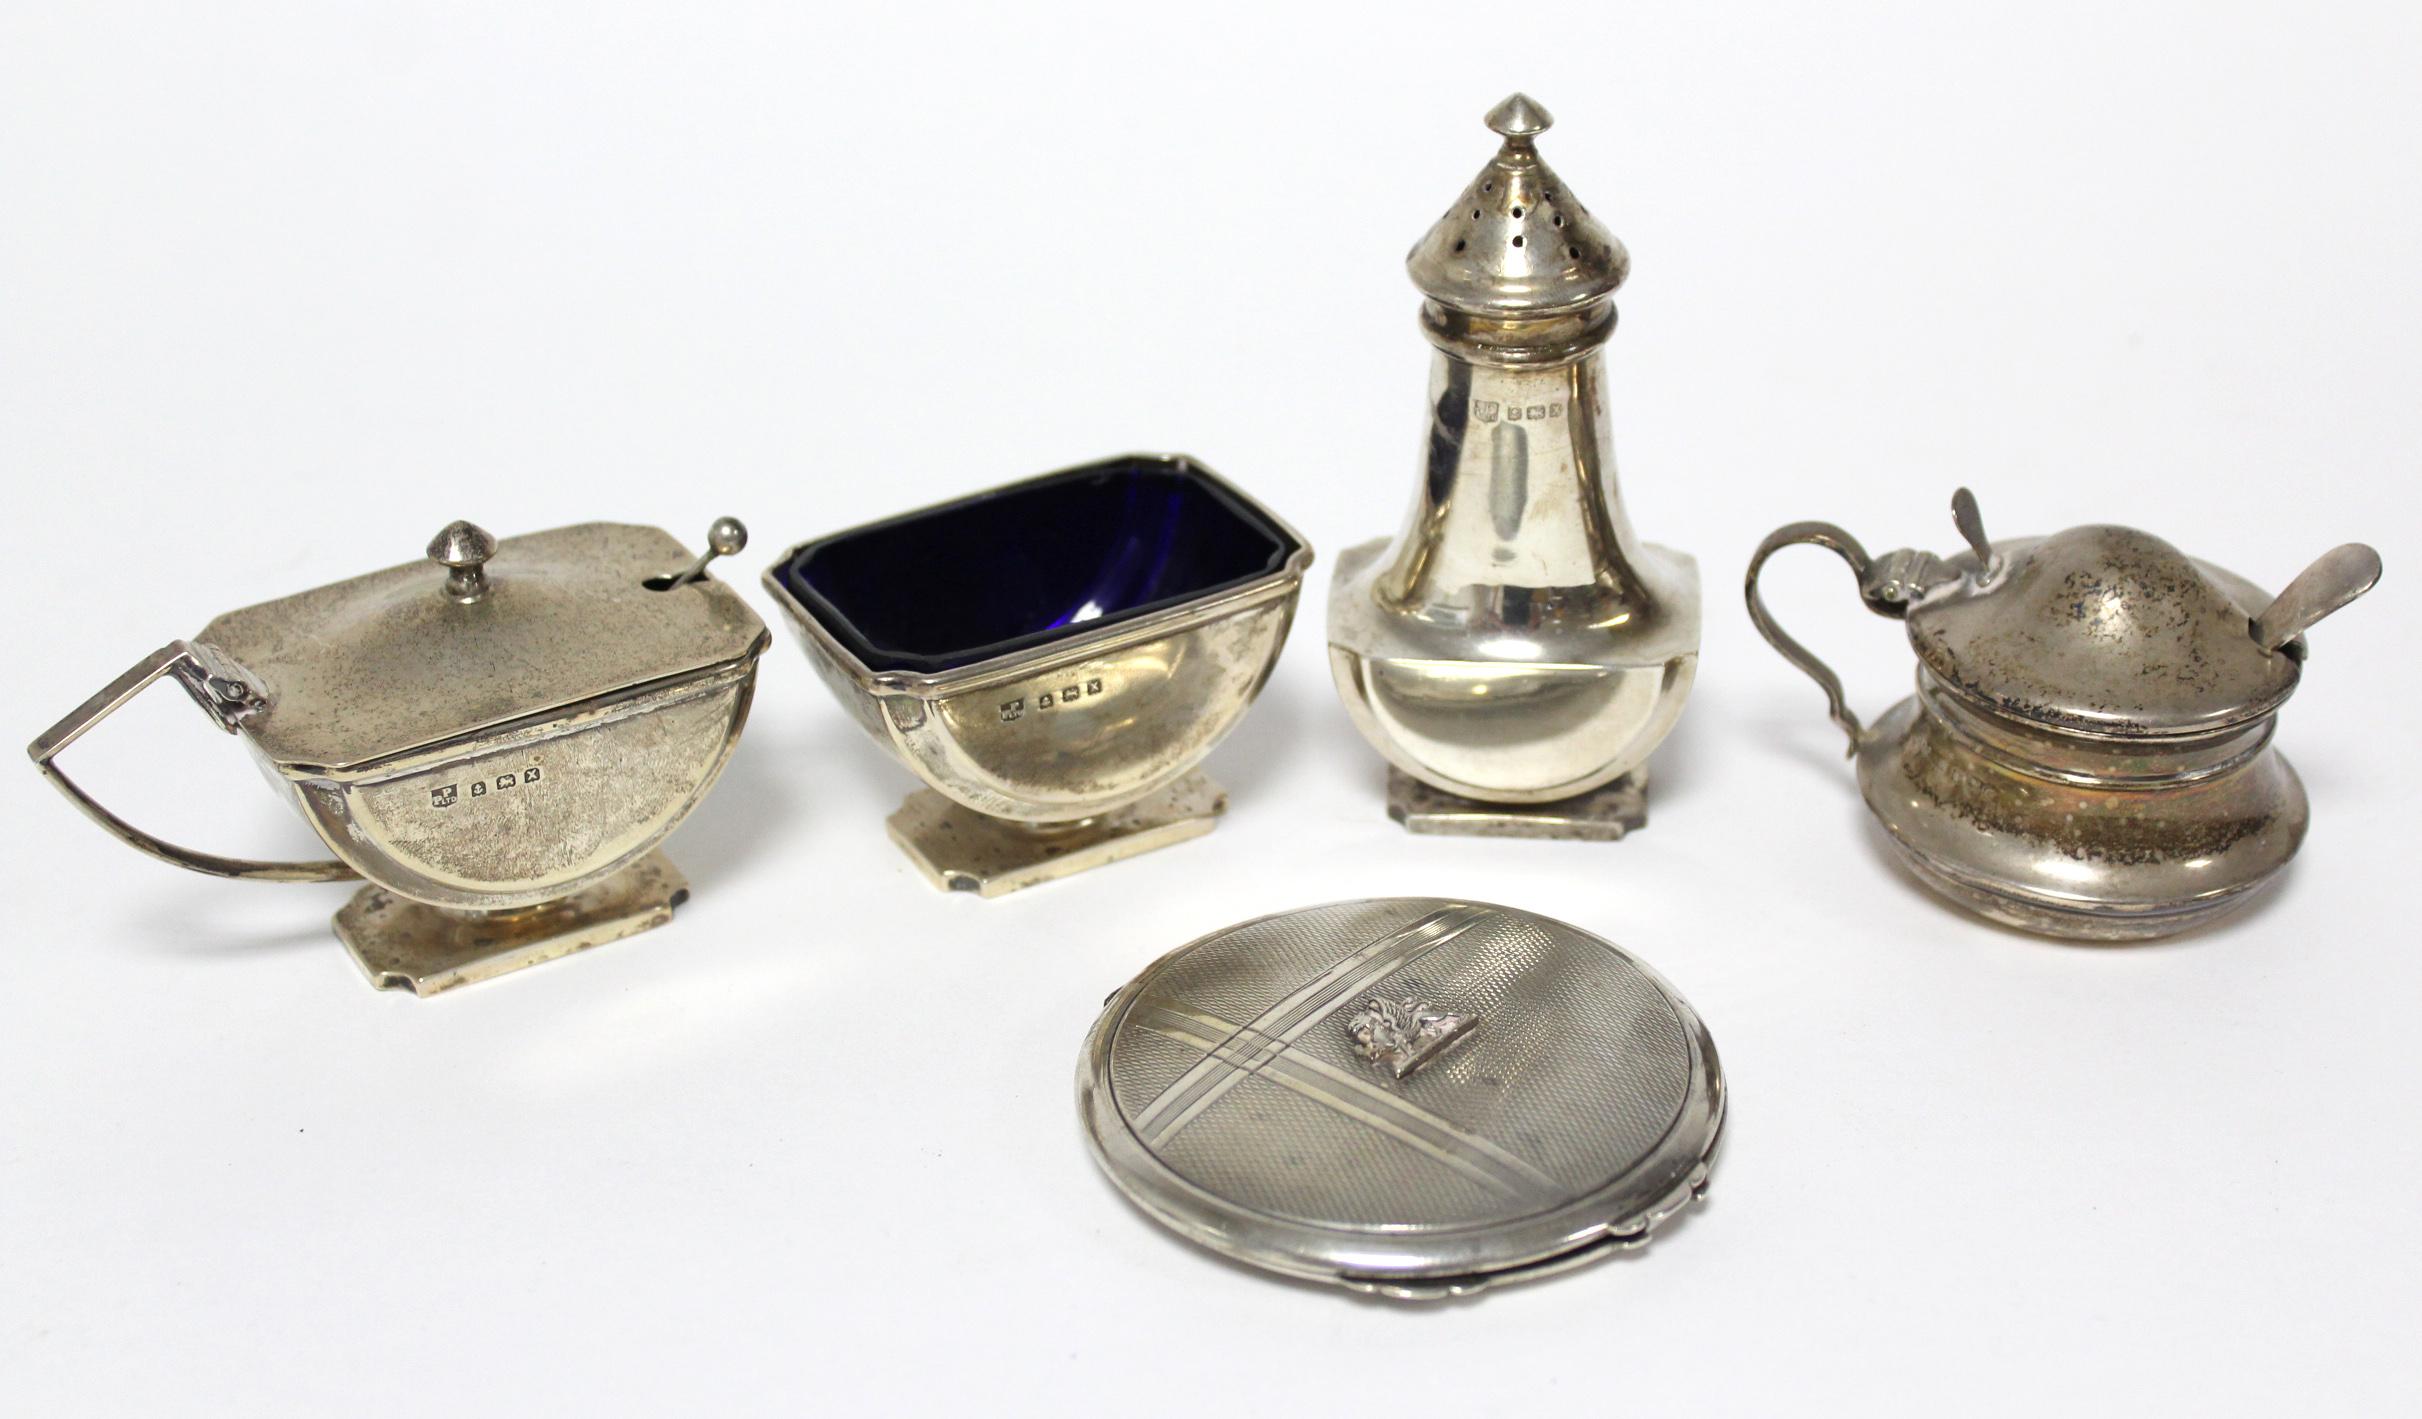 Lot 19 - A three-piece condiment set, Birmingham 1947, by Poston Products Ltd.; a circular mustard pot with